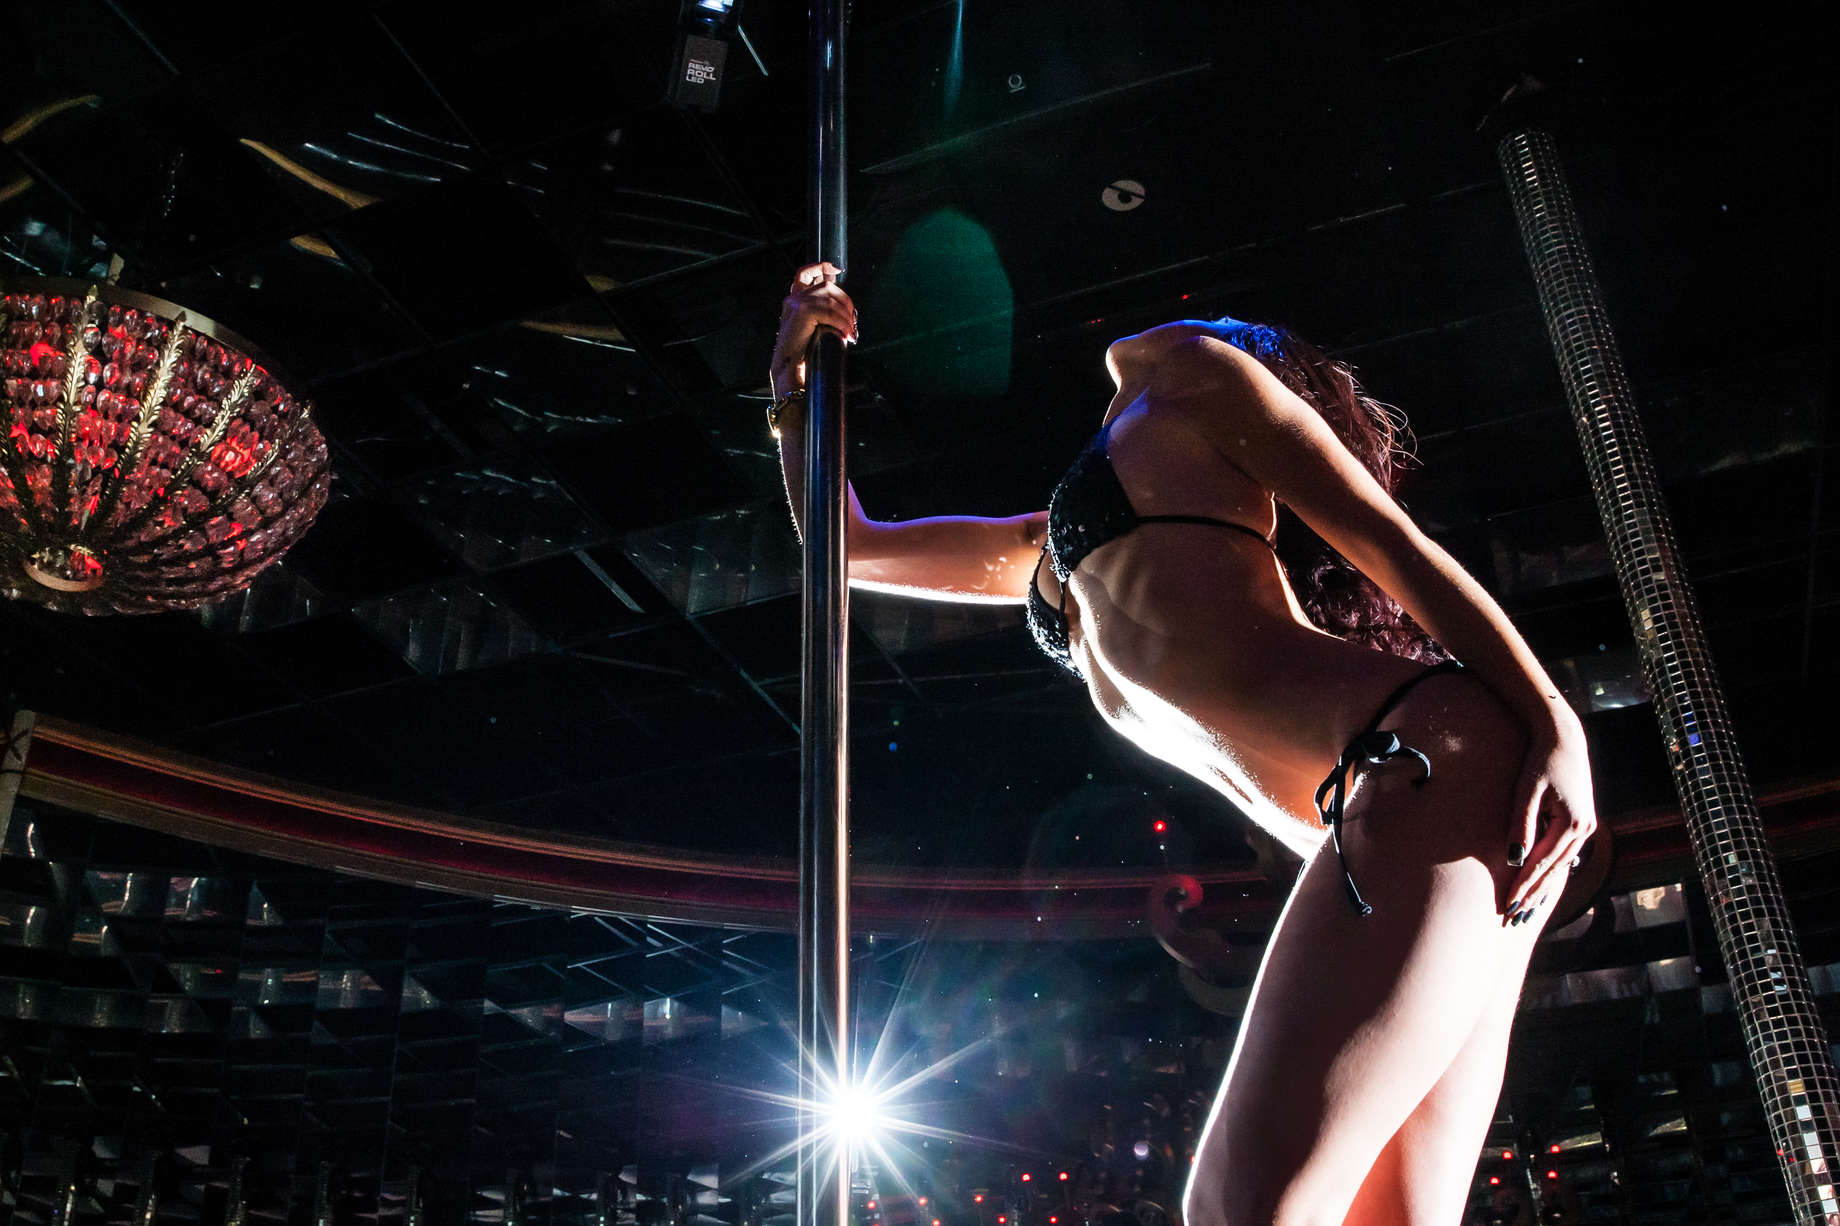 Evan longoria's wife sues tampa strip club over photo use